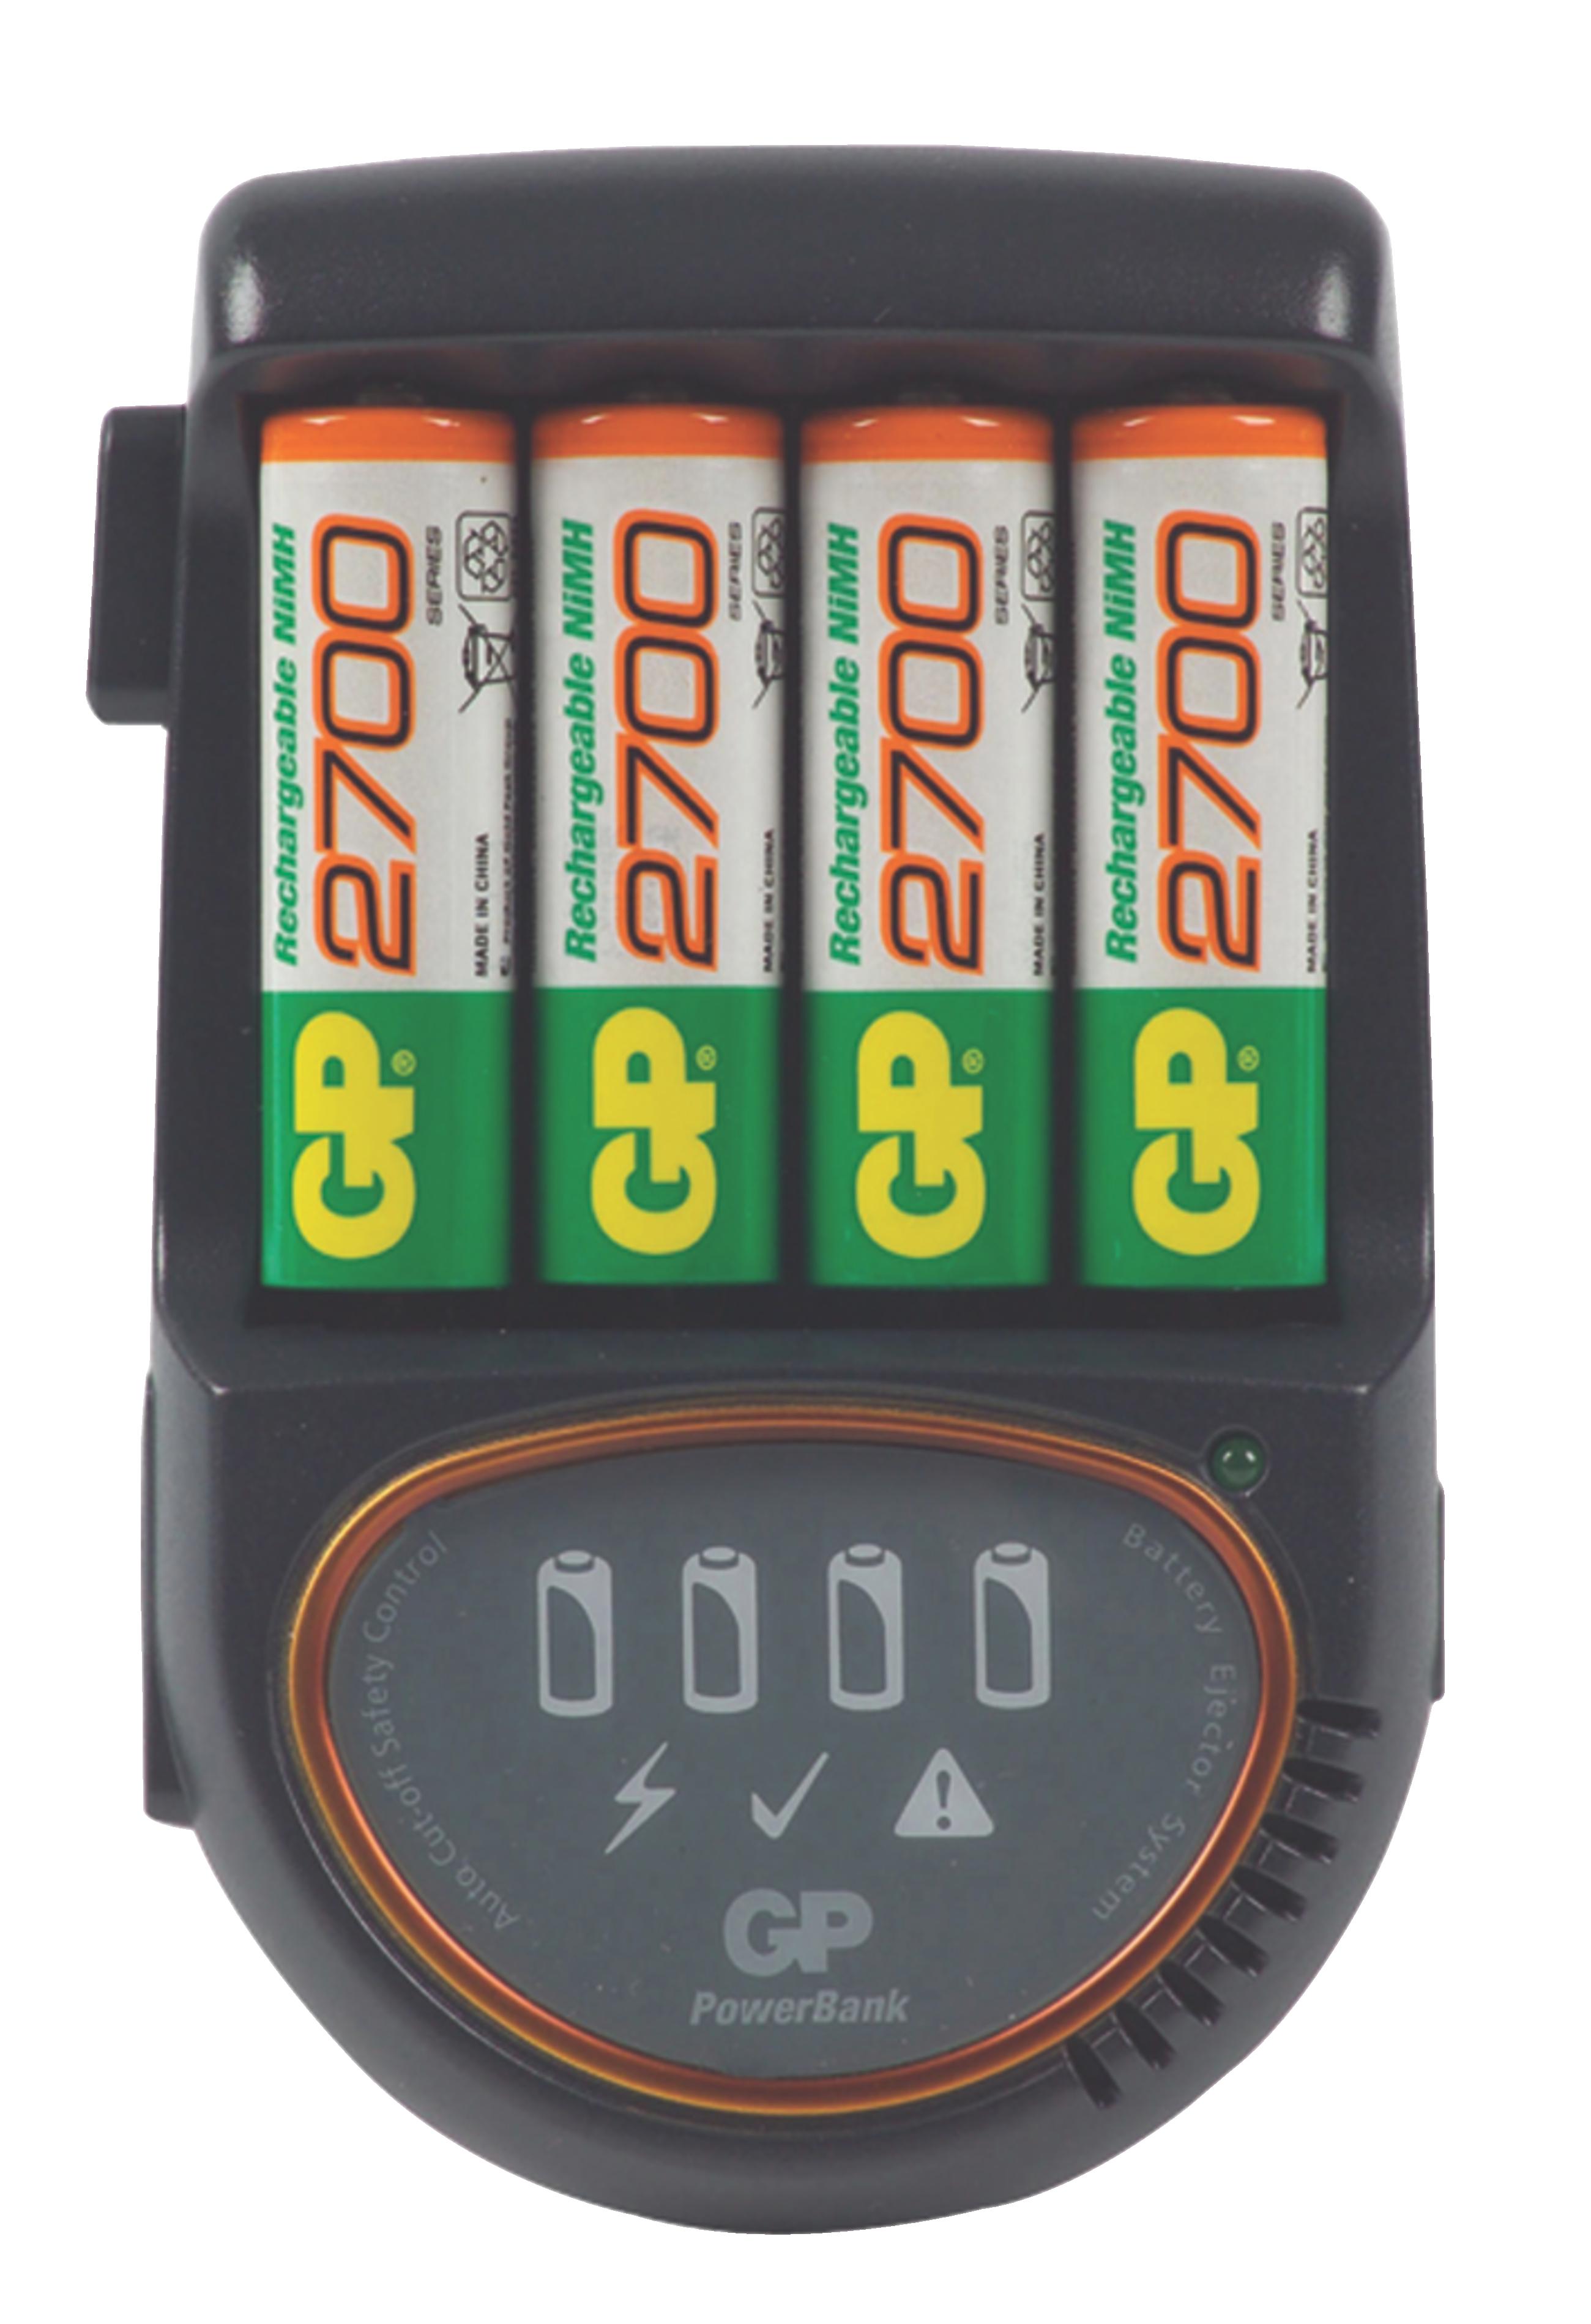 Pb H500 27 Gp Nimh Battery Charger Aa Aaa 4x Aa Hr6